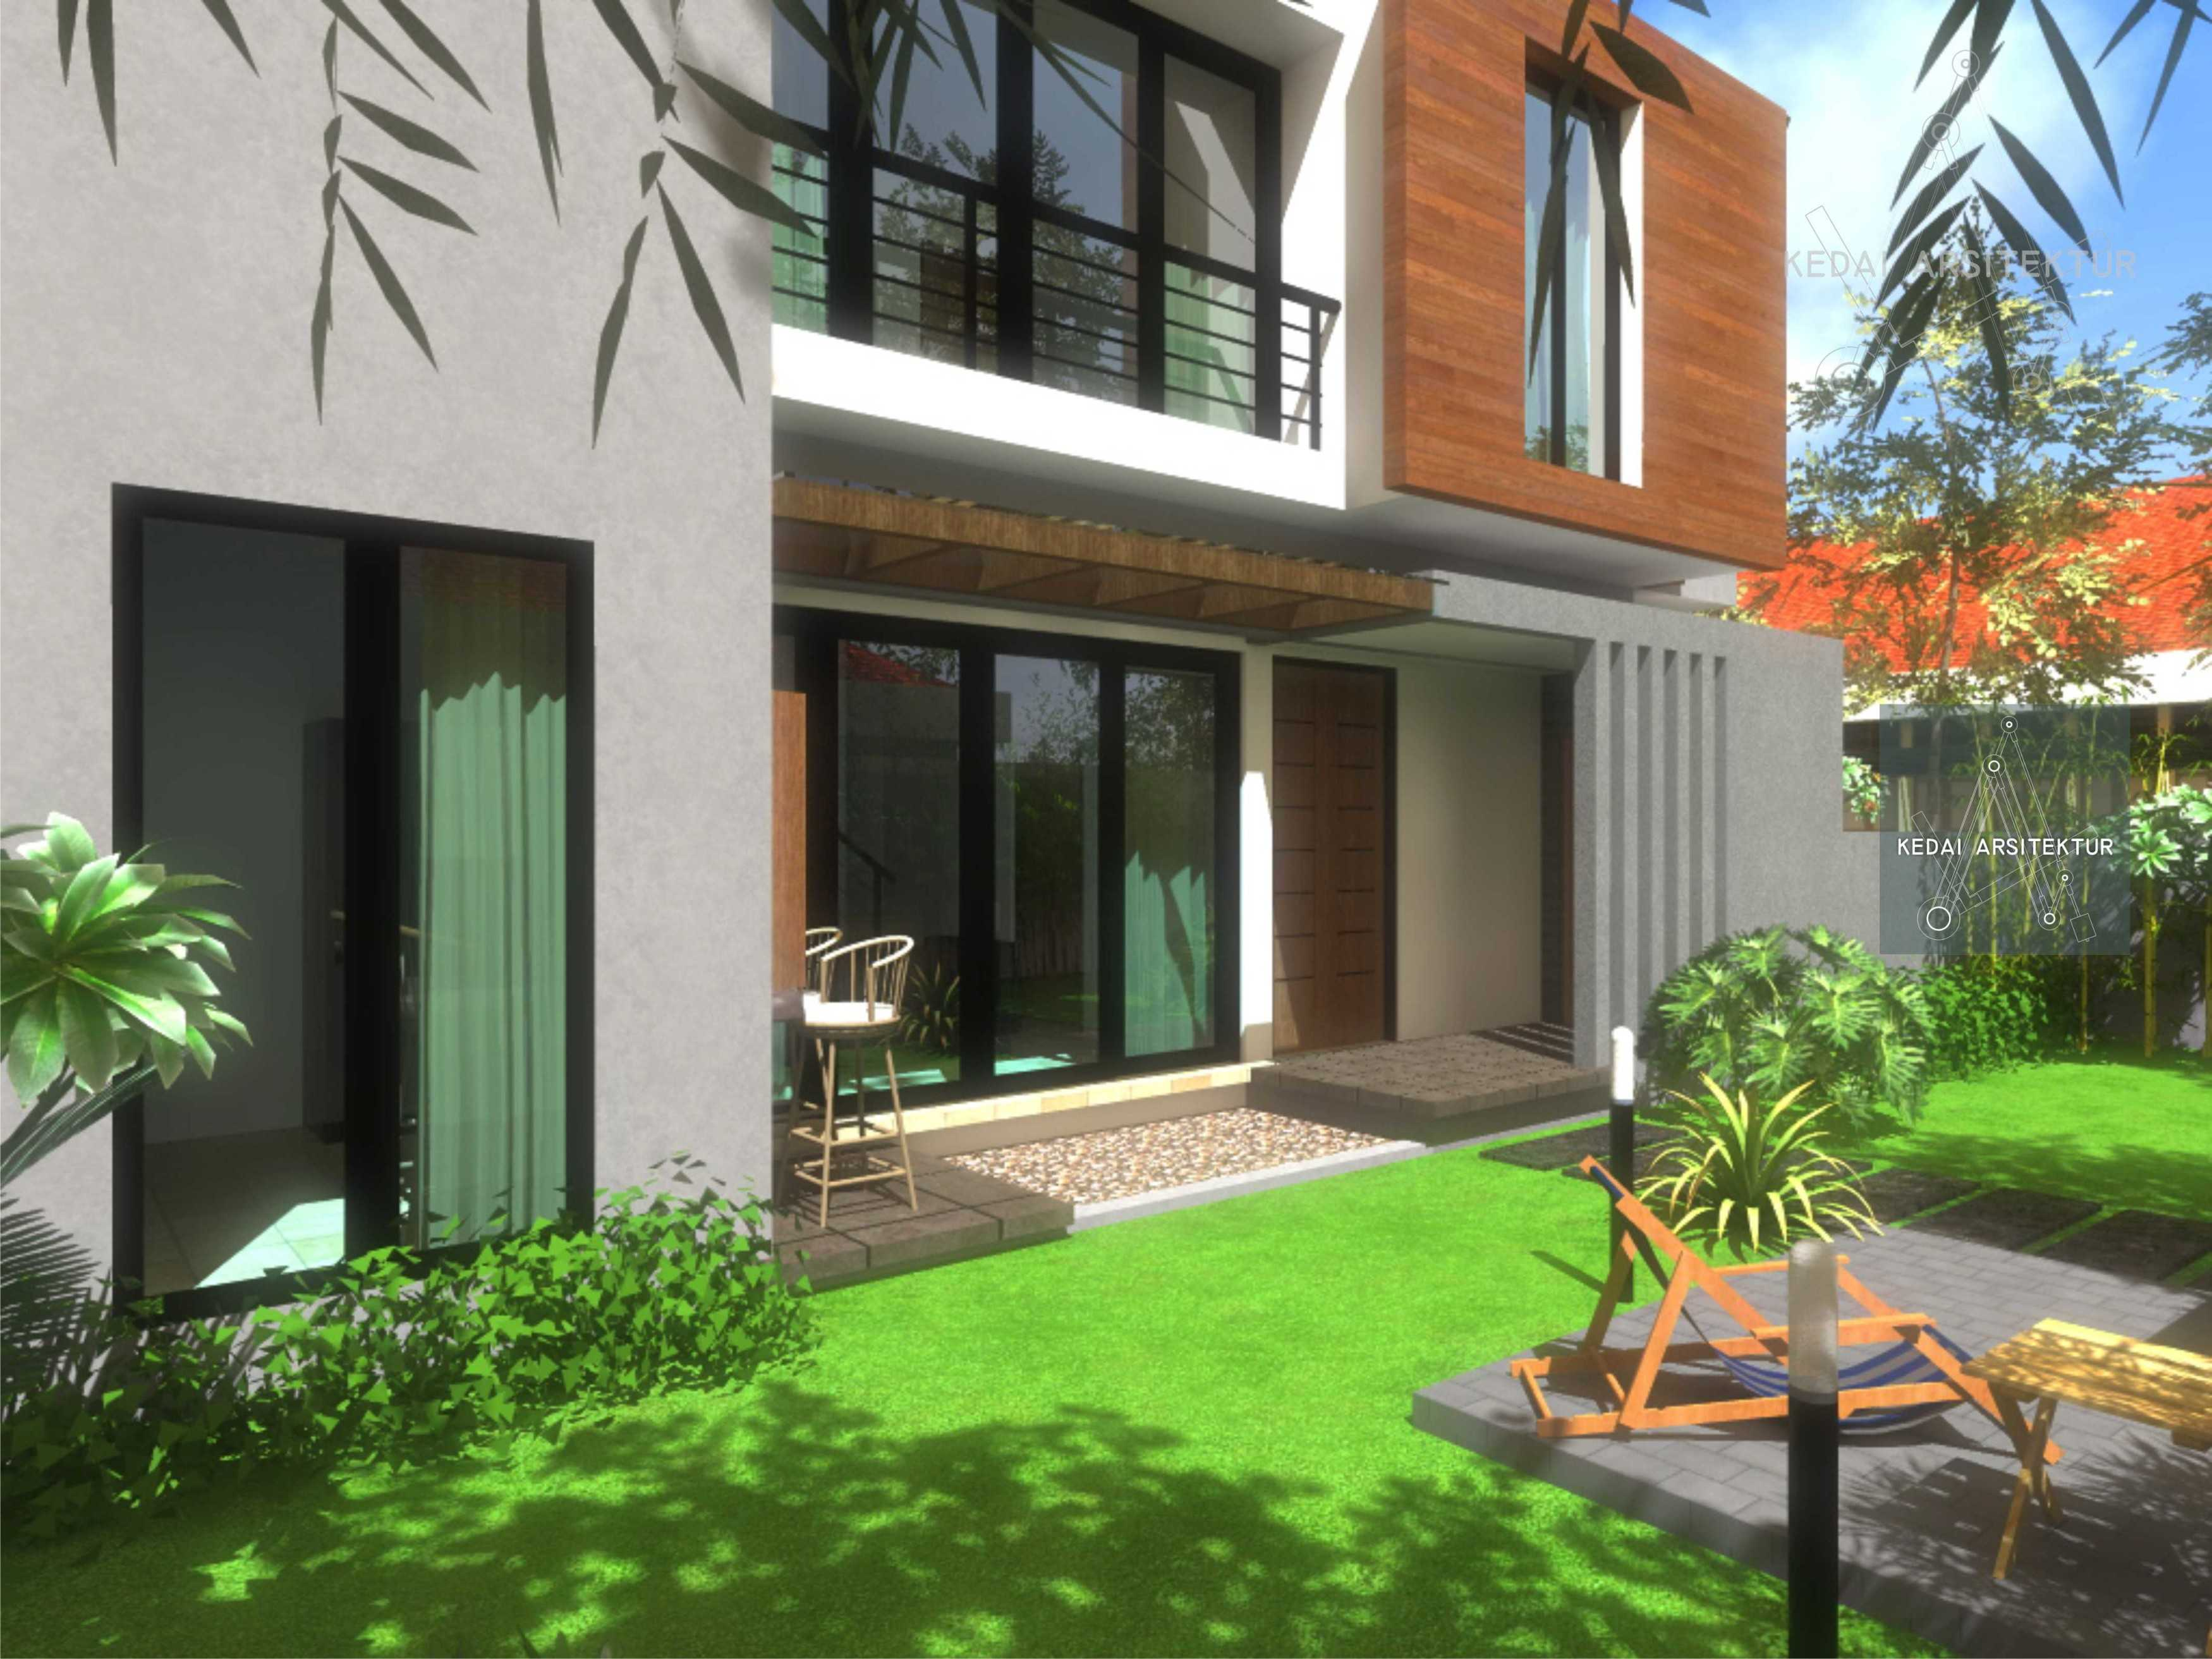 Kedai.arsitektur House In Cilebut Jl. Pendidikan 2, Cilebut, Cilebut Bar., Sukaraja, Bogor, Jawa Barat 16157, Indonesia  Rmh-Cilebut-Image-4 Modern  35881